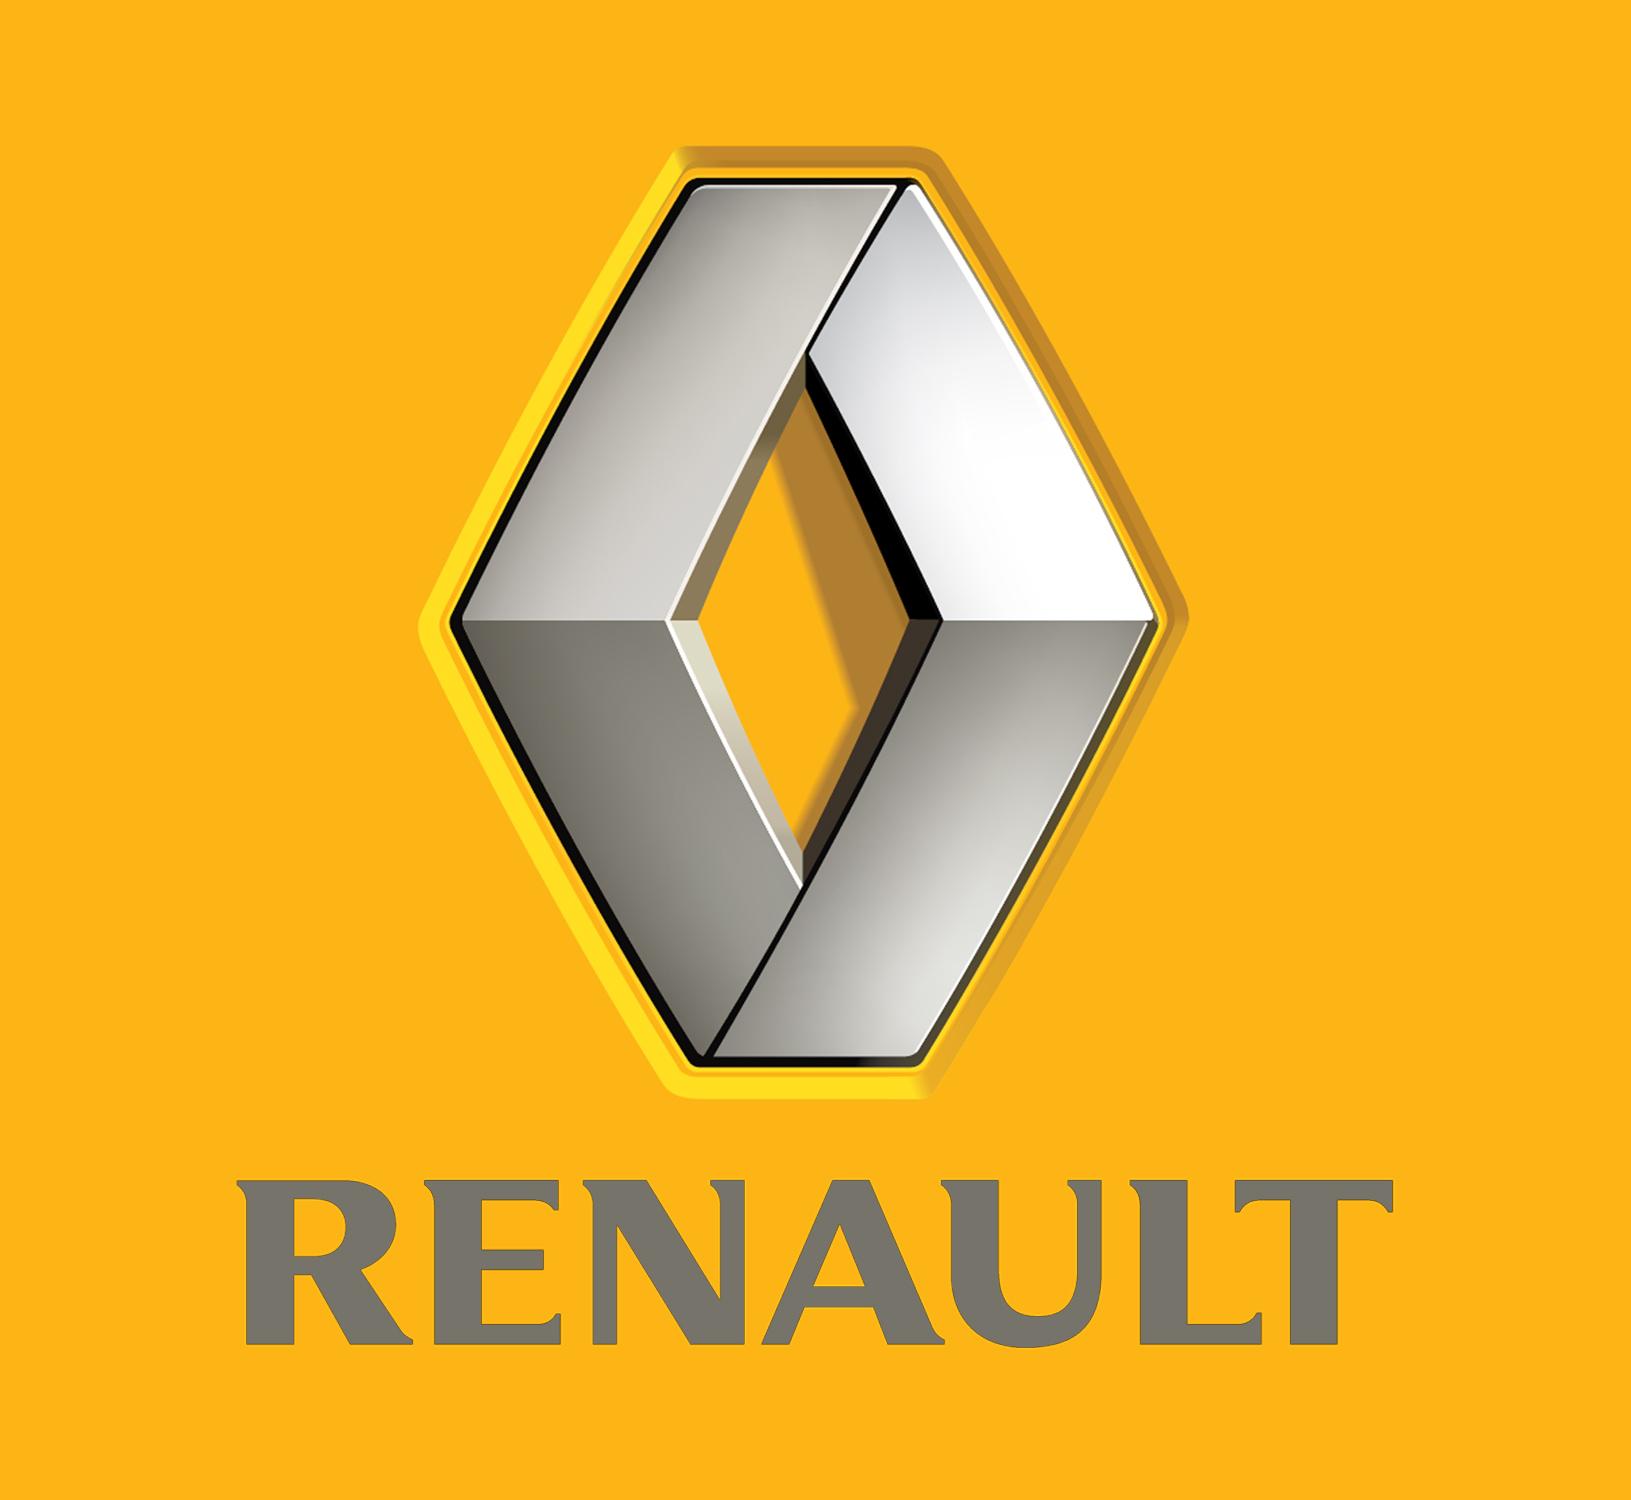 large renault car logo zero to 60 times. Black Bedroom Furniture Sets. Home Design Ideas